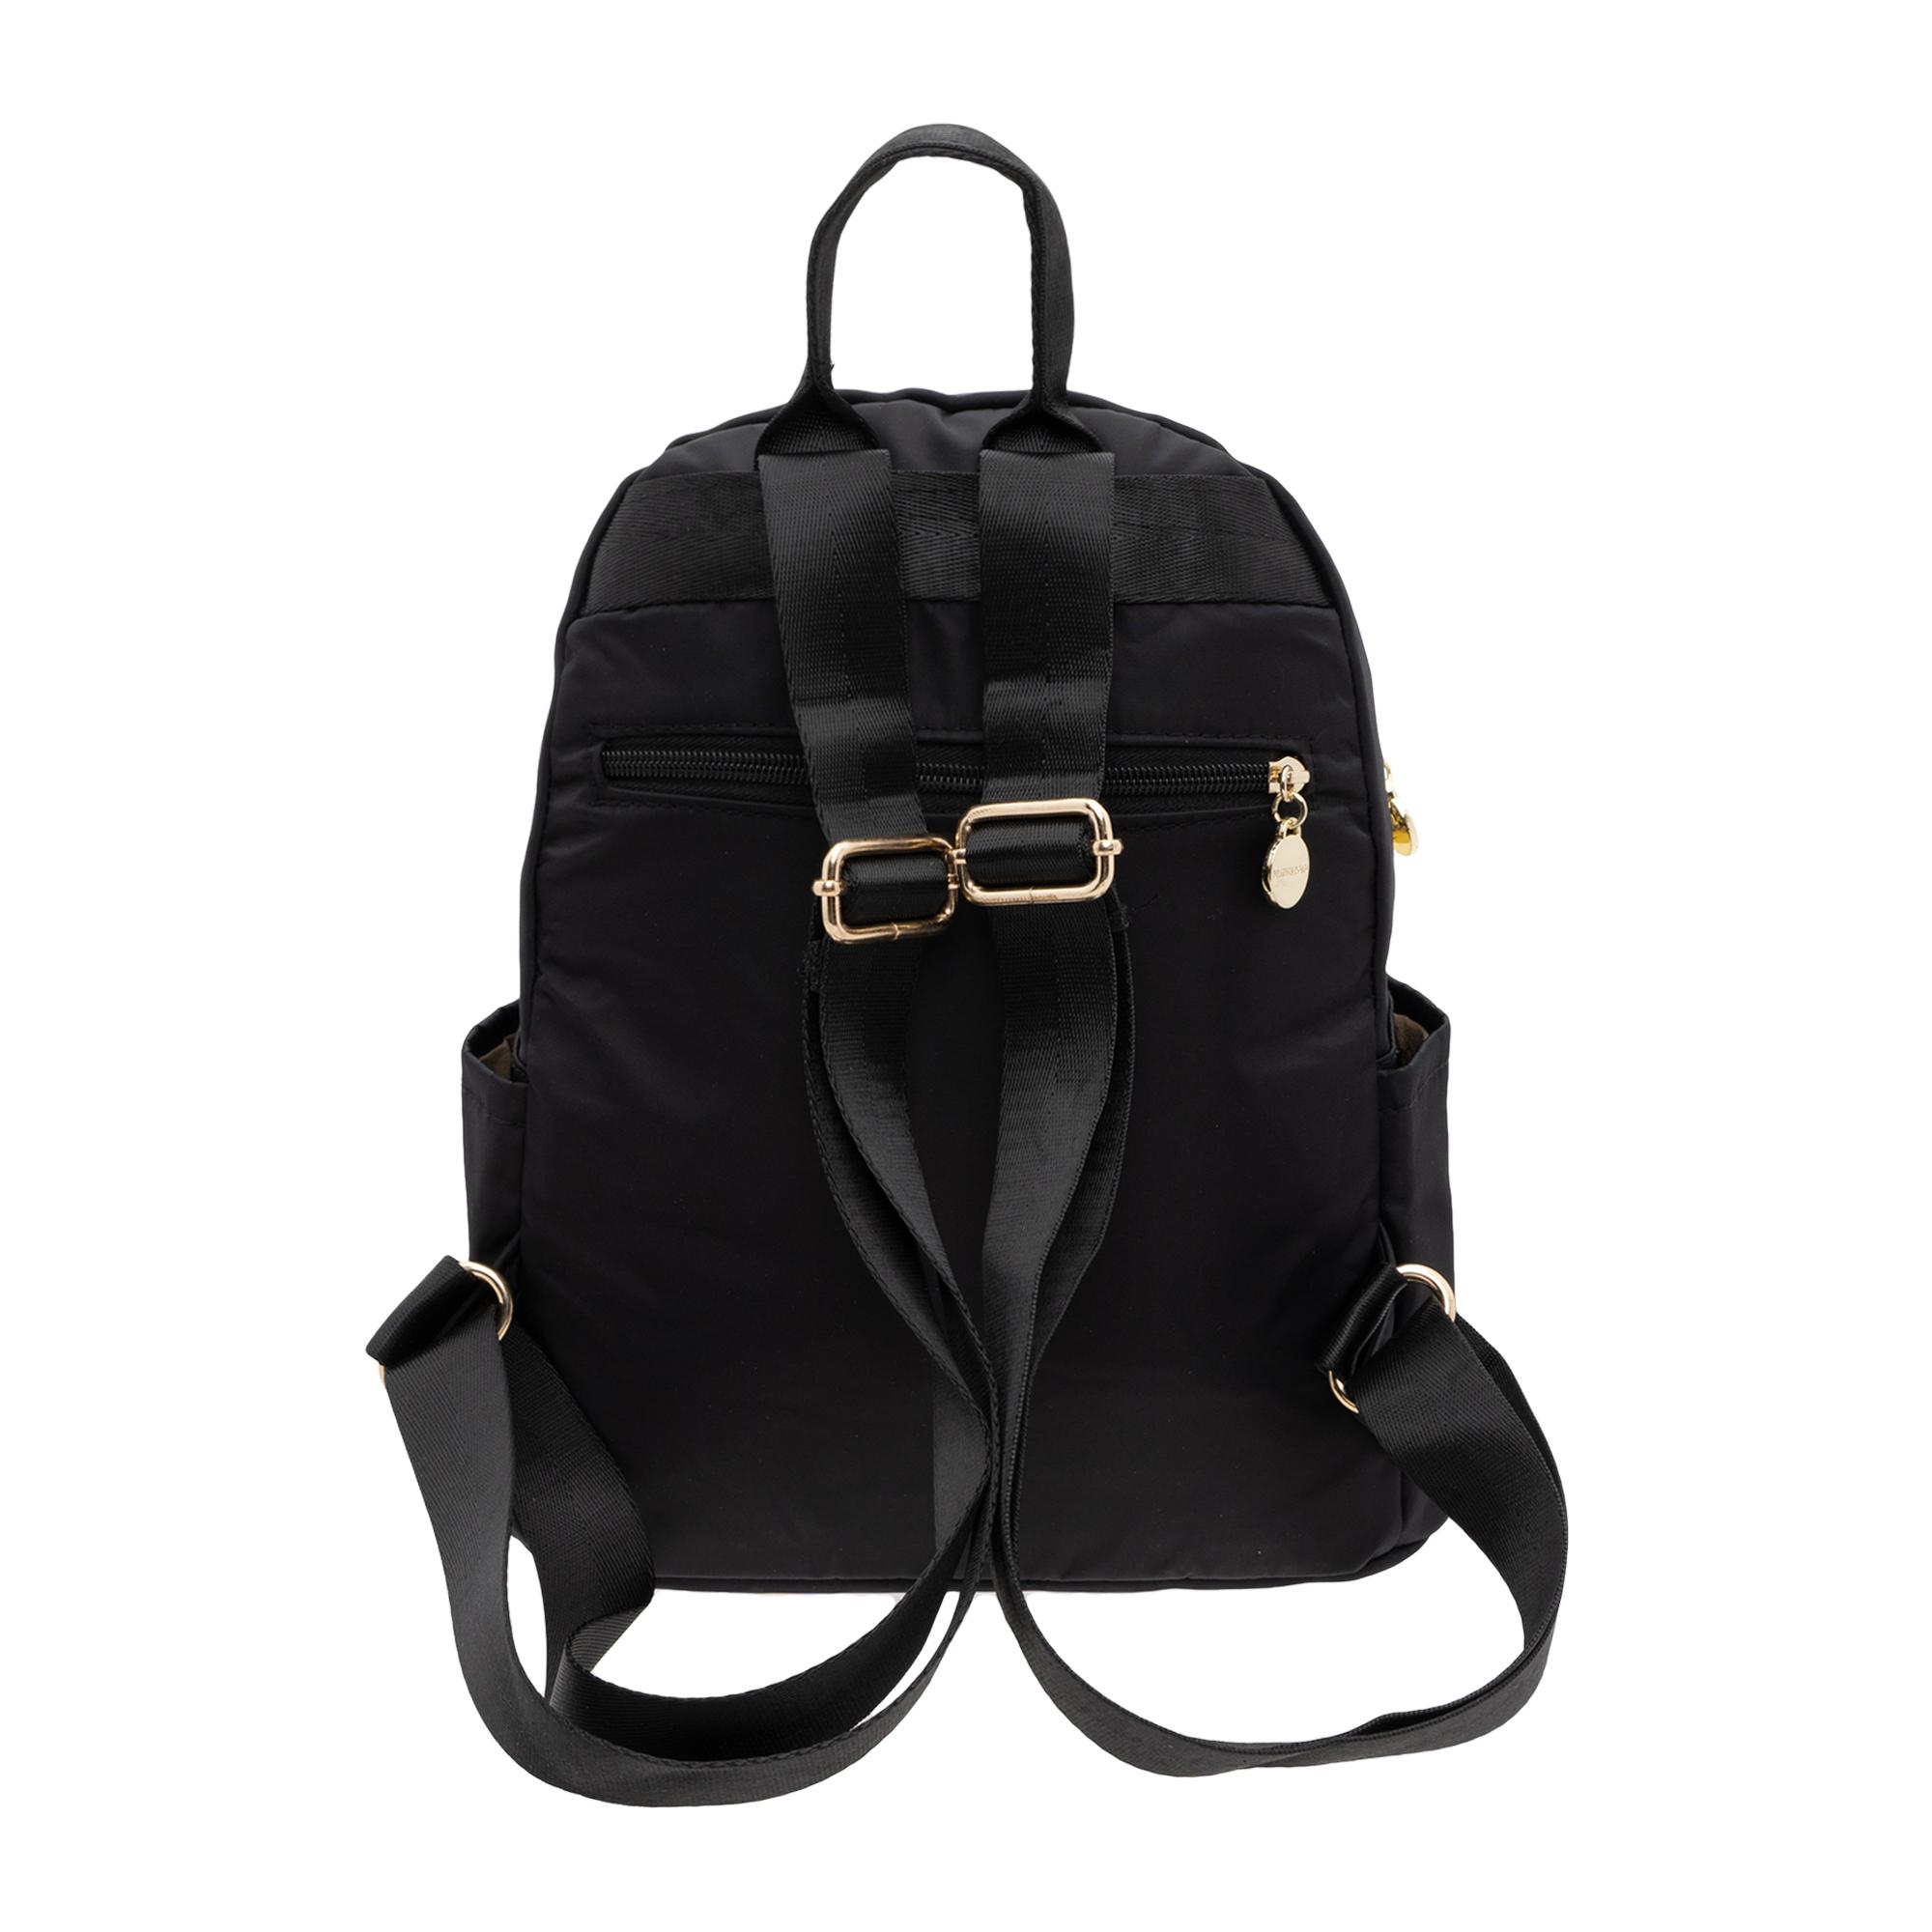 British Polo Nylon Backpack